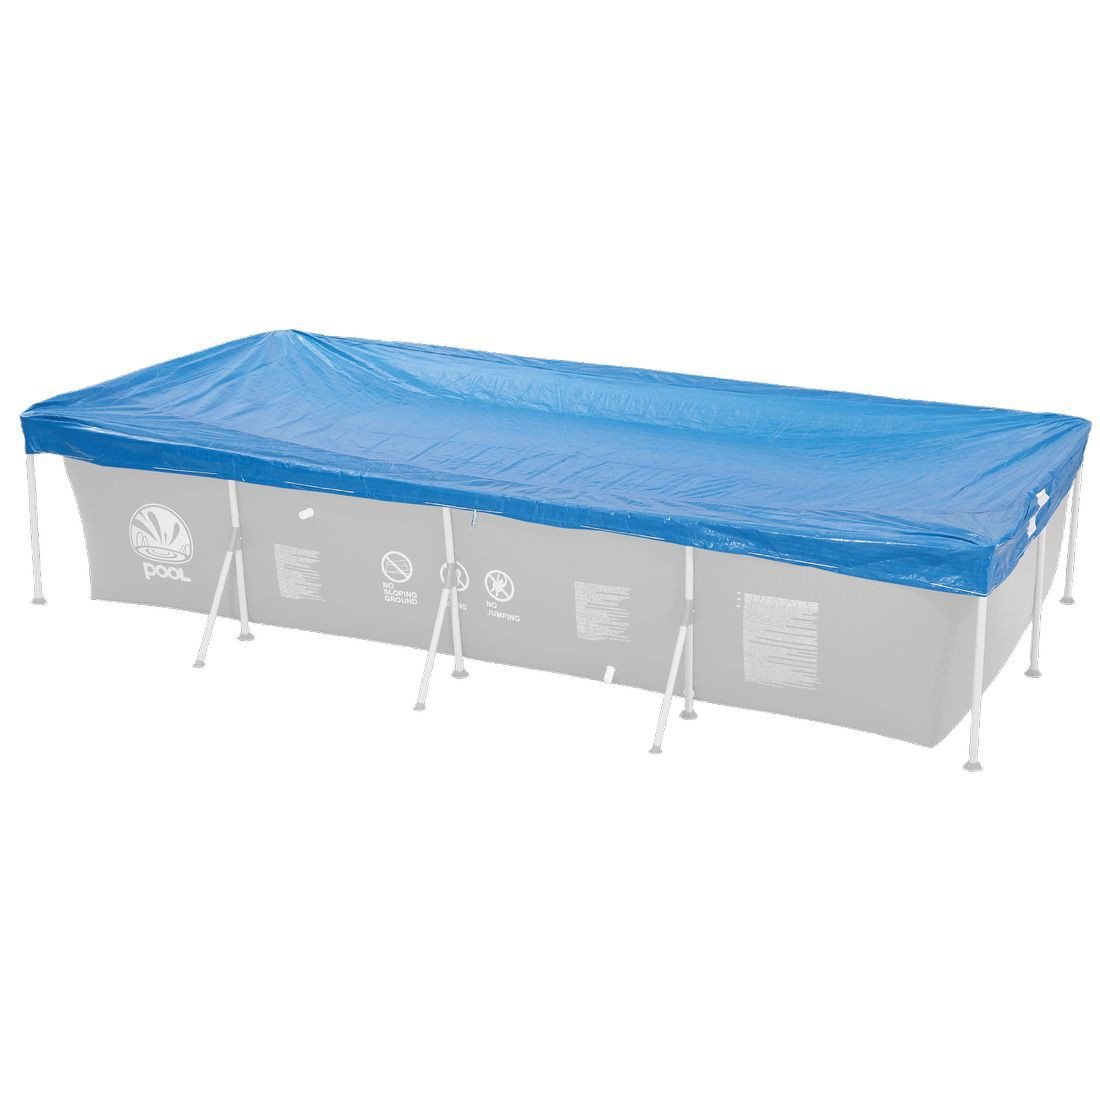 jilong pc 258x179 sfp pool abdeckung f r rechteckige stahlrahmen pools von jilong bei camping. Black Bedroom Furniture Sets. Home Design Ideas